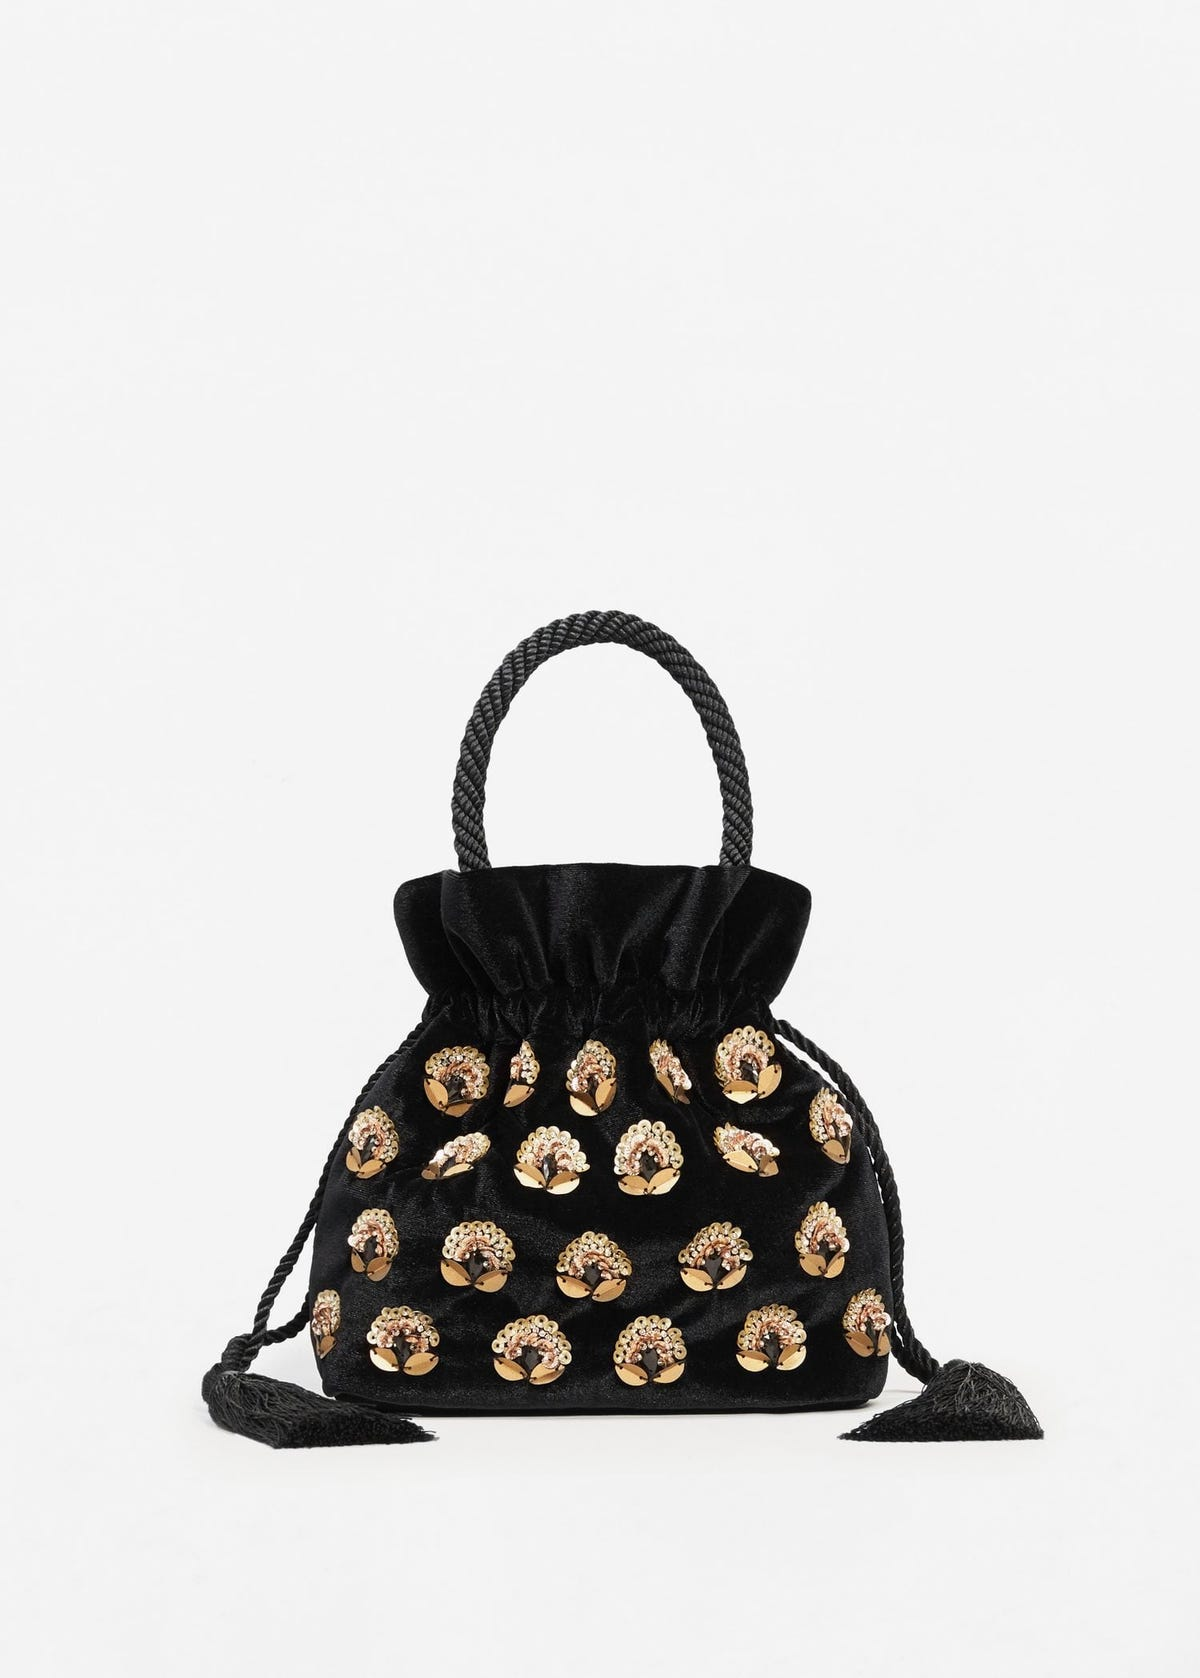 2a3359fe Best Handbags - 2018 New Trends Bag Styles